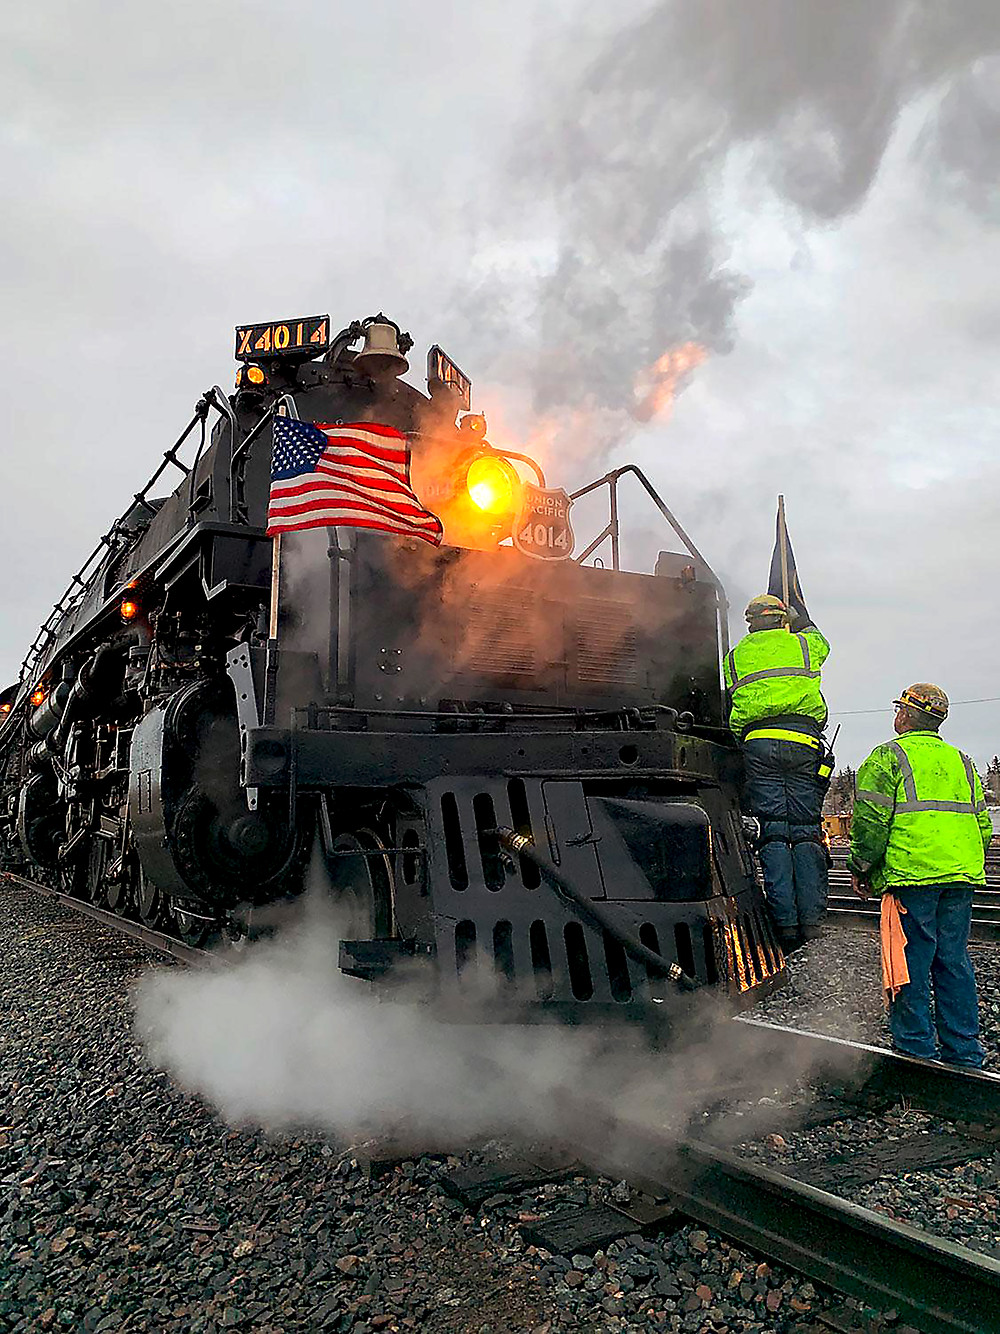 Union Pacific Big Boy No. 4014